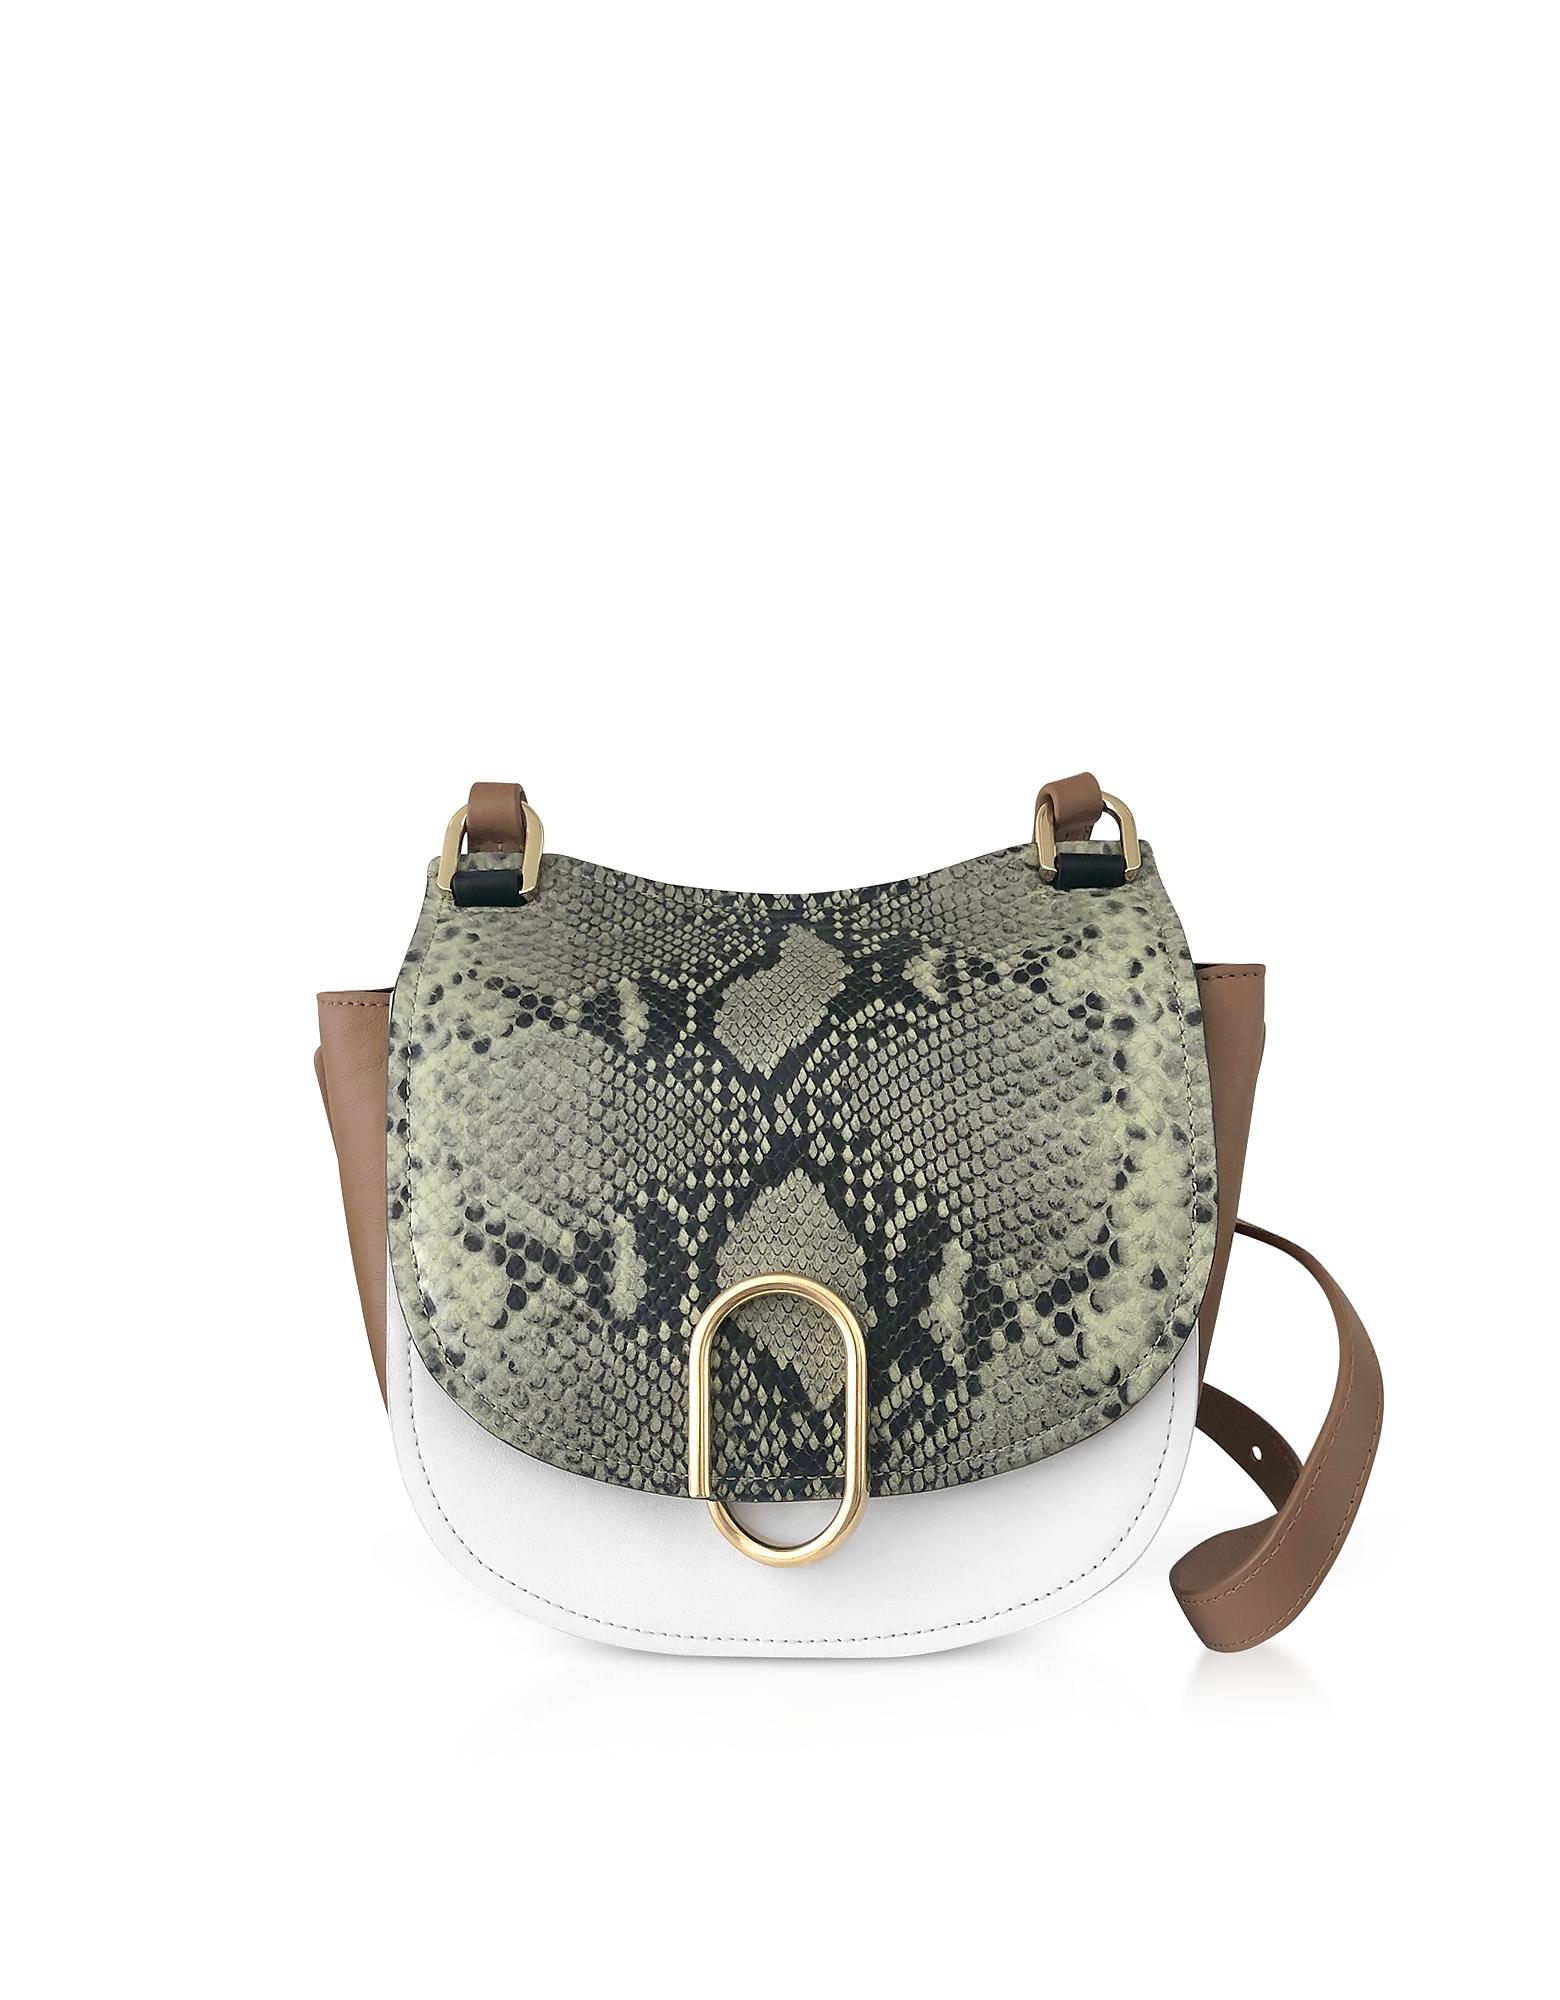 3.1 Phillip Lim  Handbags Animal Printed Leather Alix Hunter Shoulder Bag